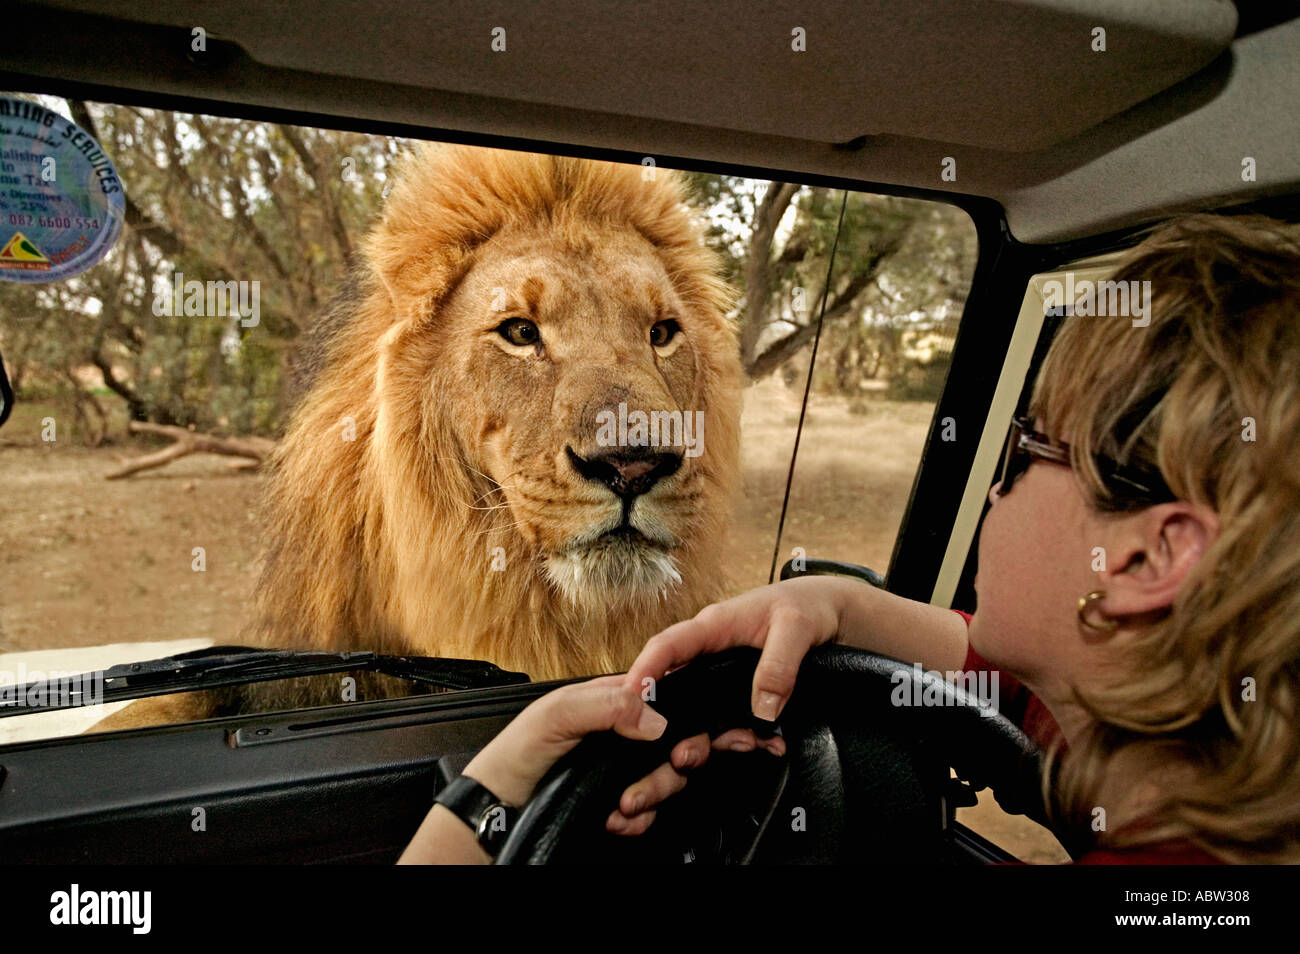 León León Panthera leo mirando a través de la ventana de modelo del vehículo turístico liberó Sudáfrica Dist el África subsahariana Imagen De Stock